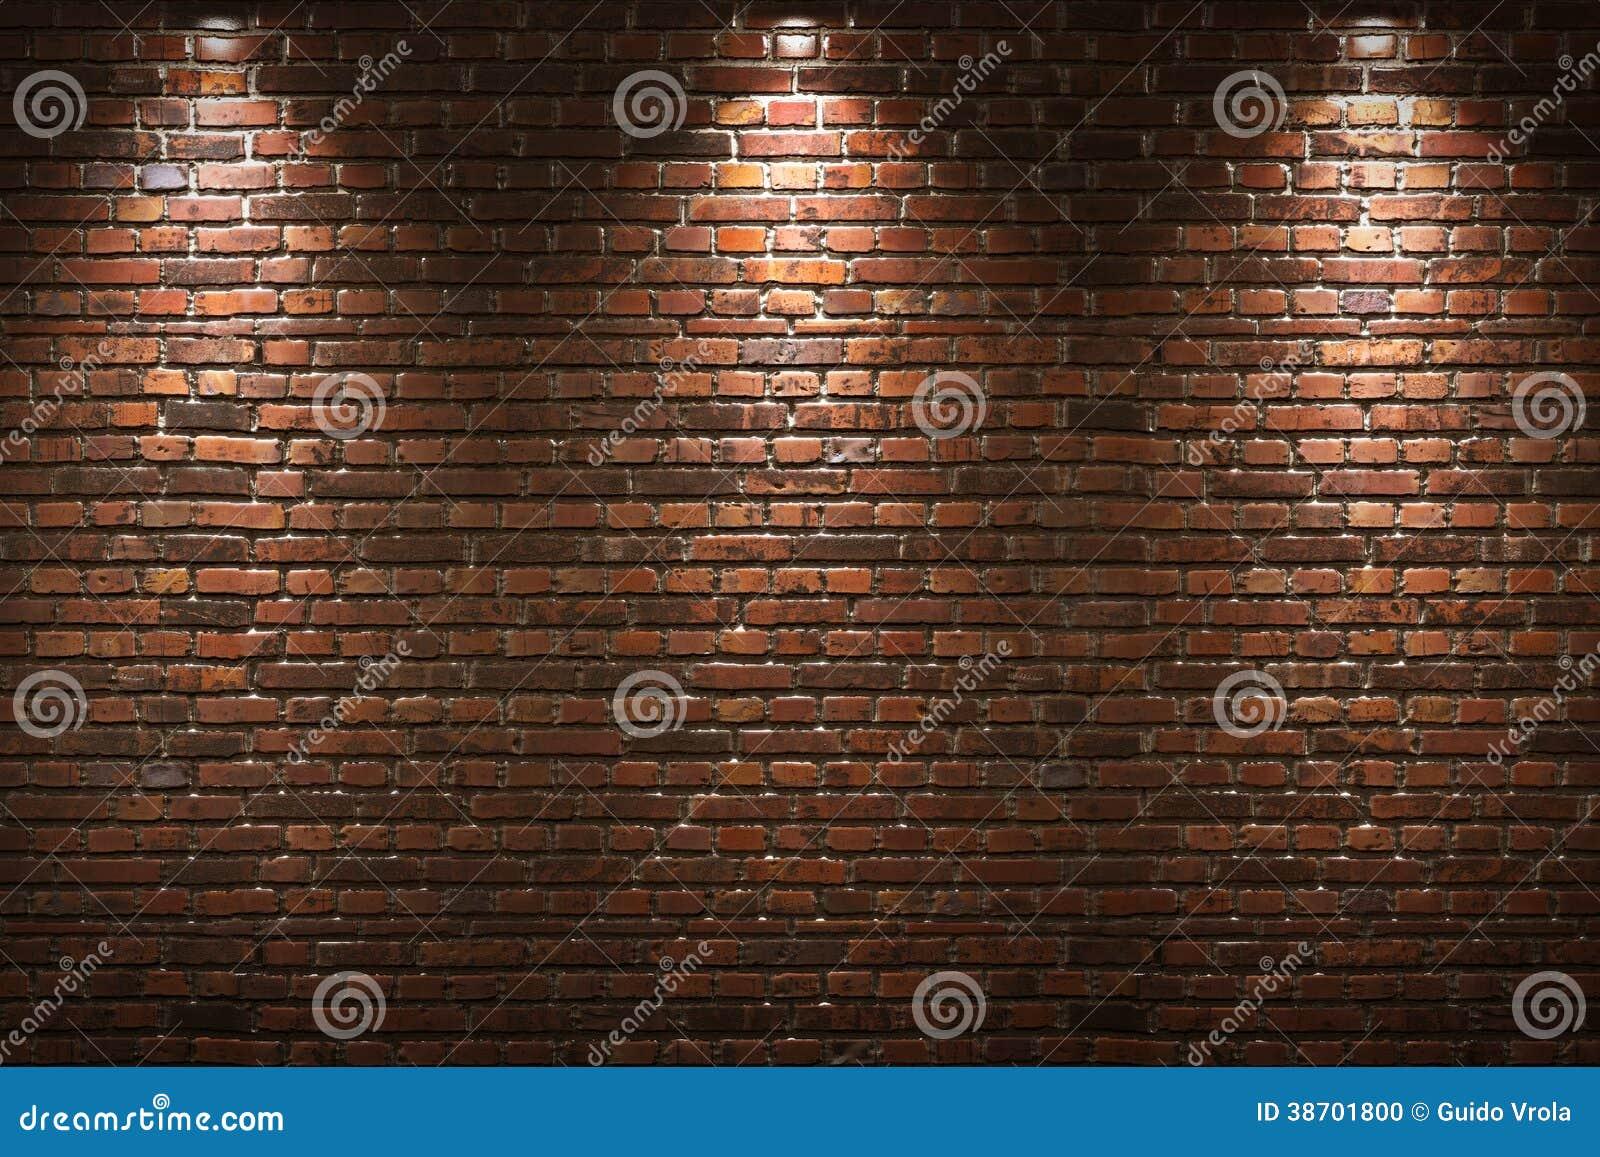 Pared de ladrillo iluminada foto de archivo imagen 38701800 - Pared de ladrillo ...